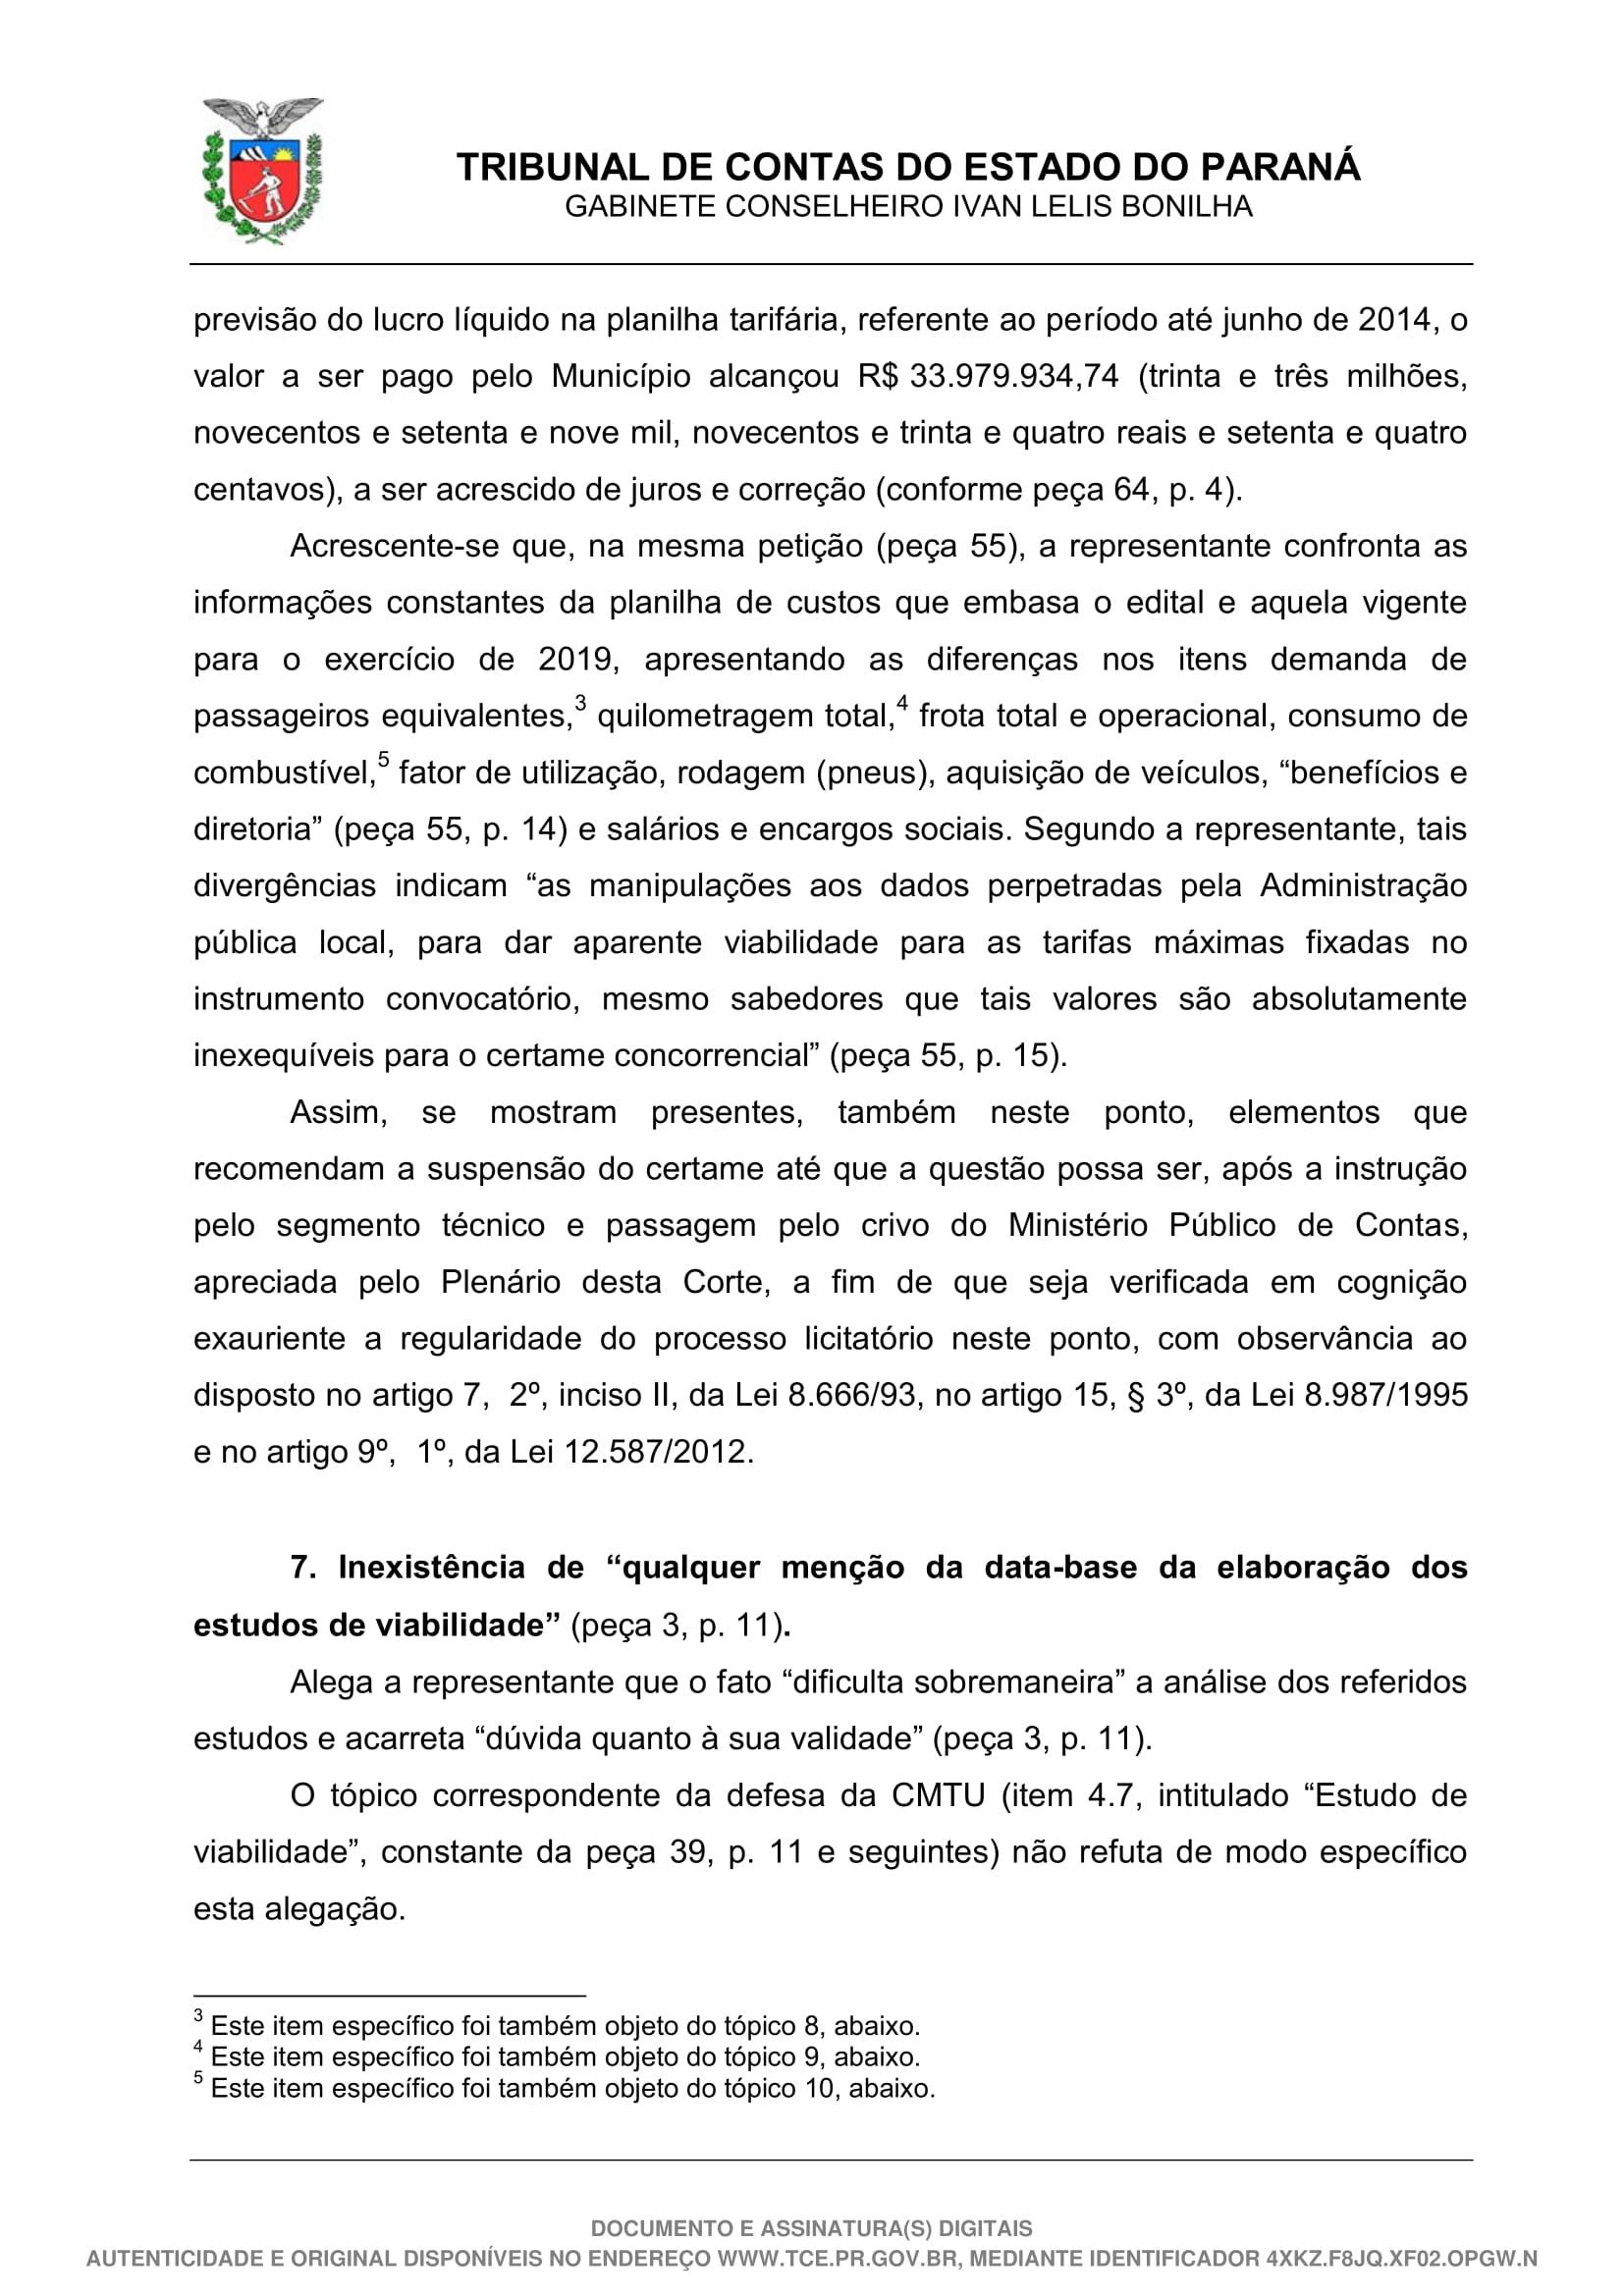 Despacho - 49-19 - GCILB-10